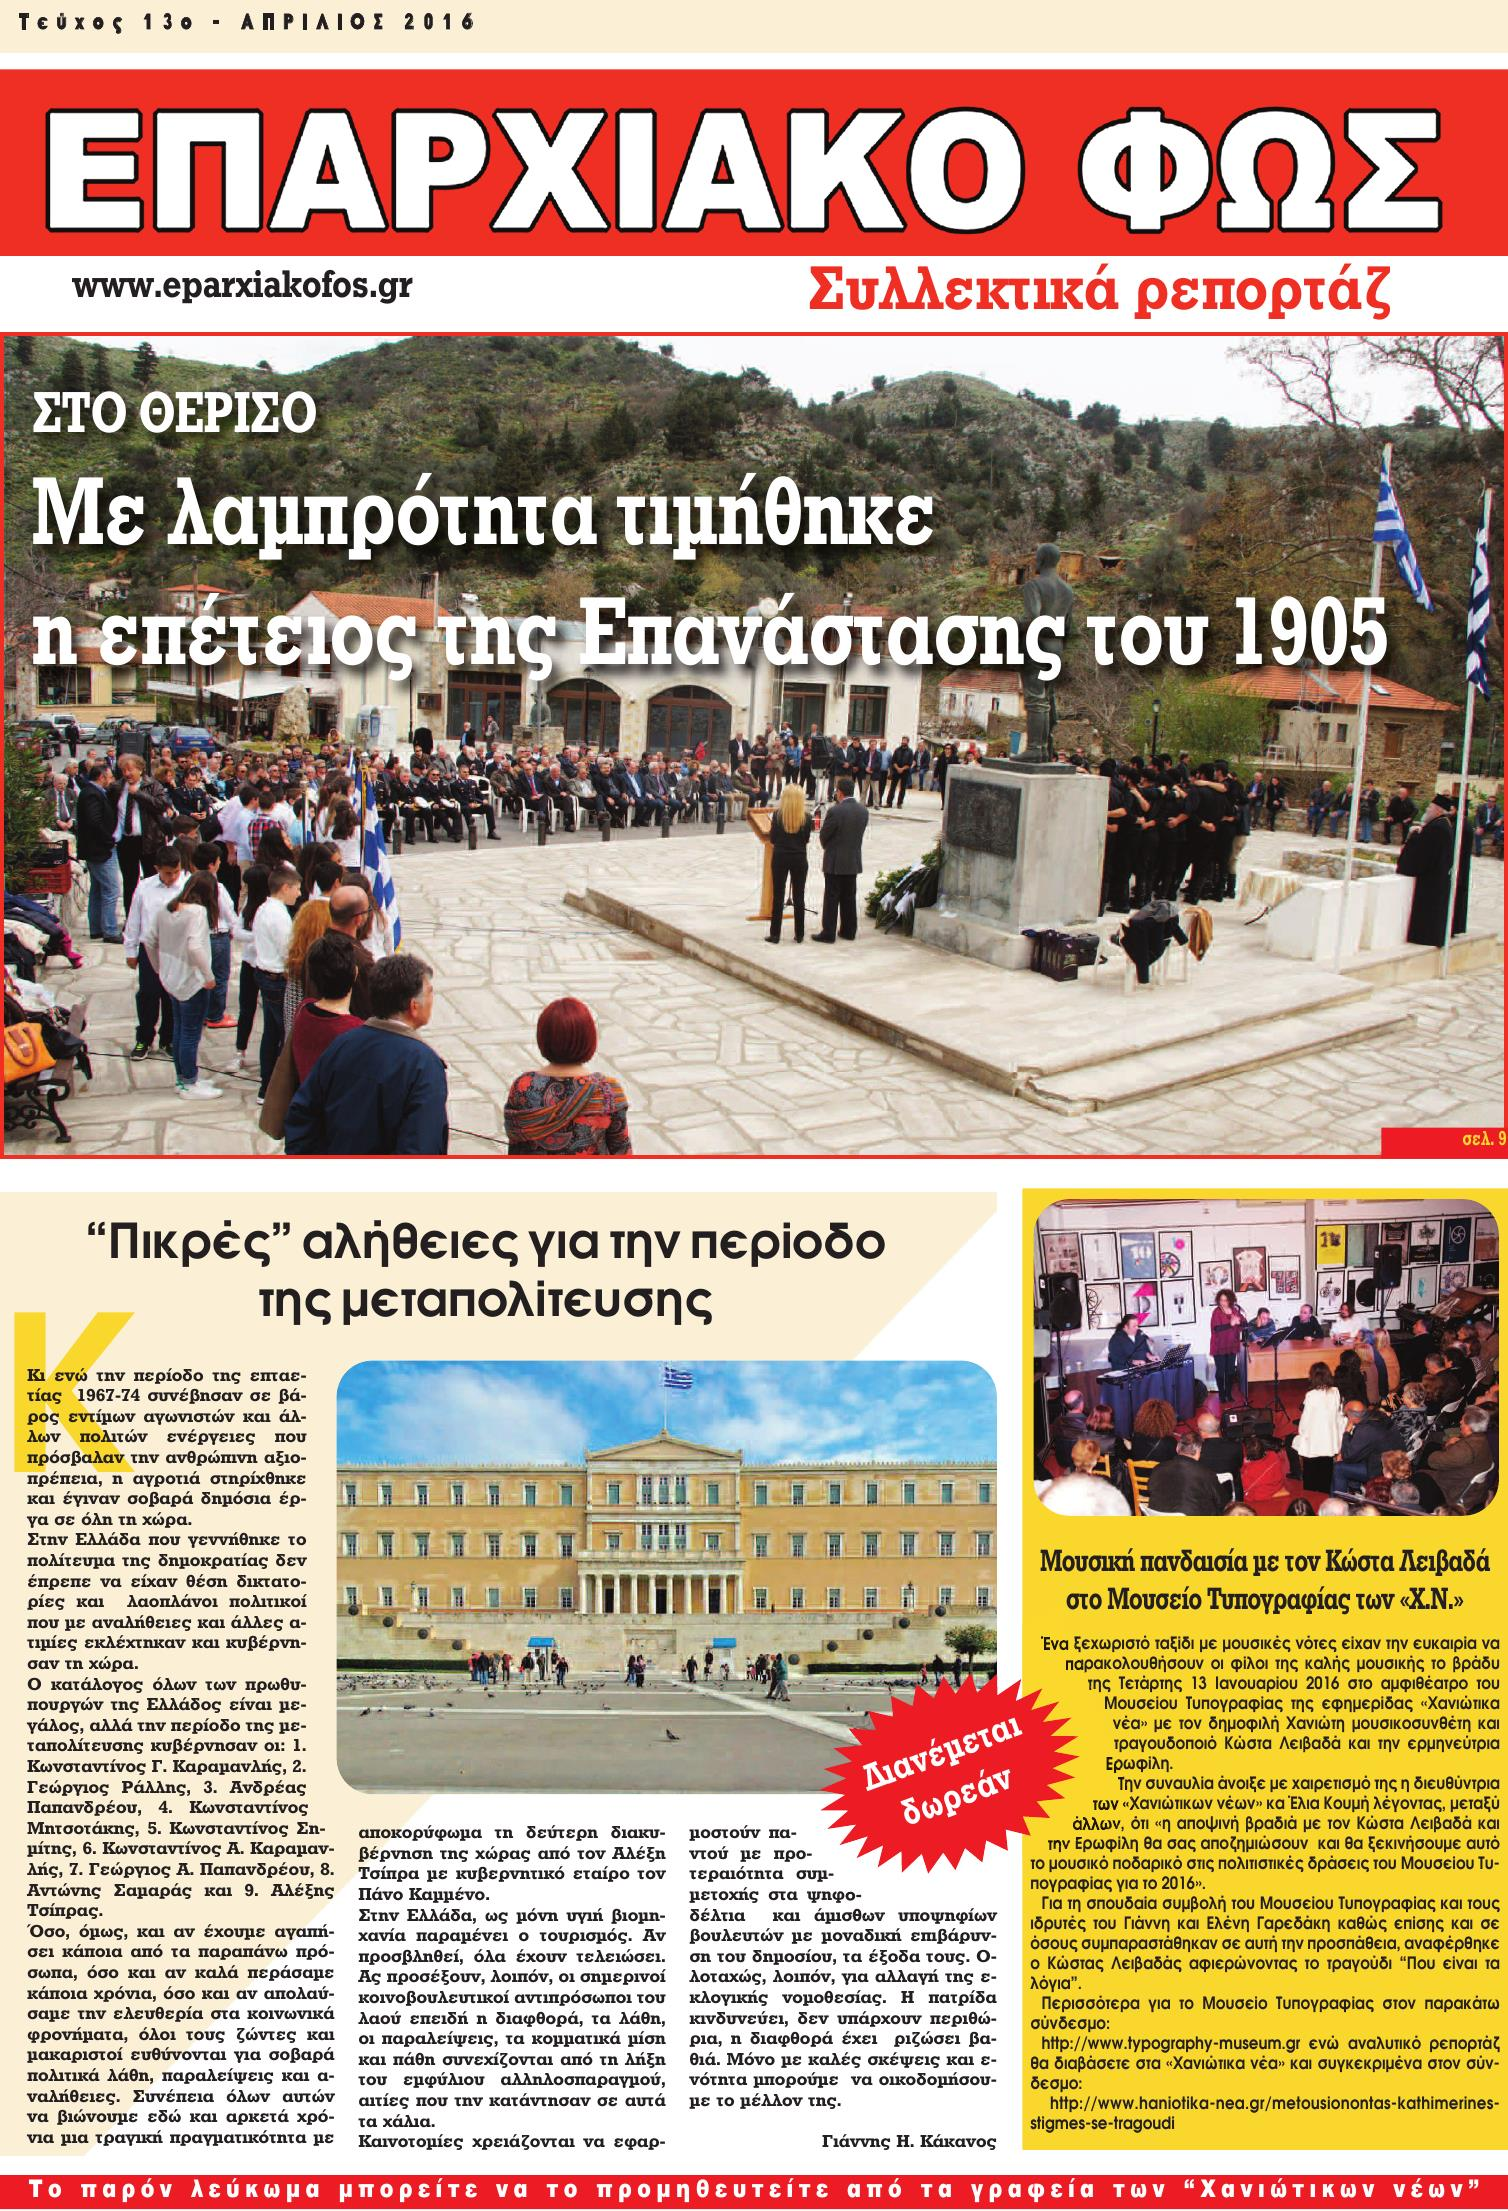 13 KAKANOS (Page 01)